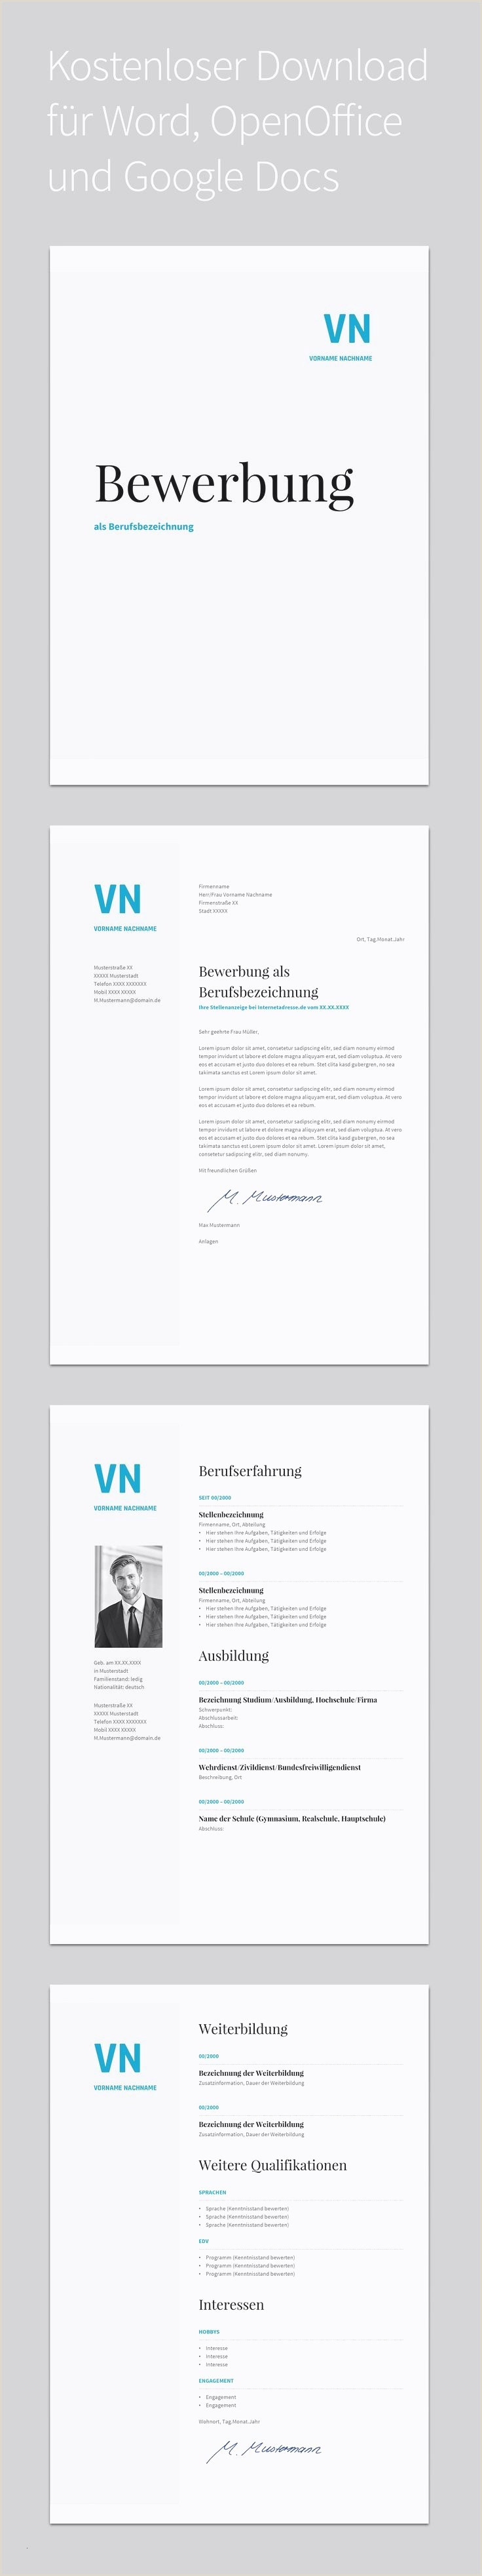 Lebenslauf Muster Bürokauffrau Bewerbung Deckblatt Bürokauffrau Neu Bewerbung Mit Deckblatt